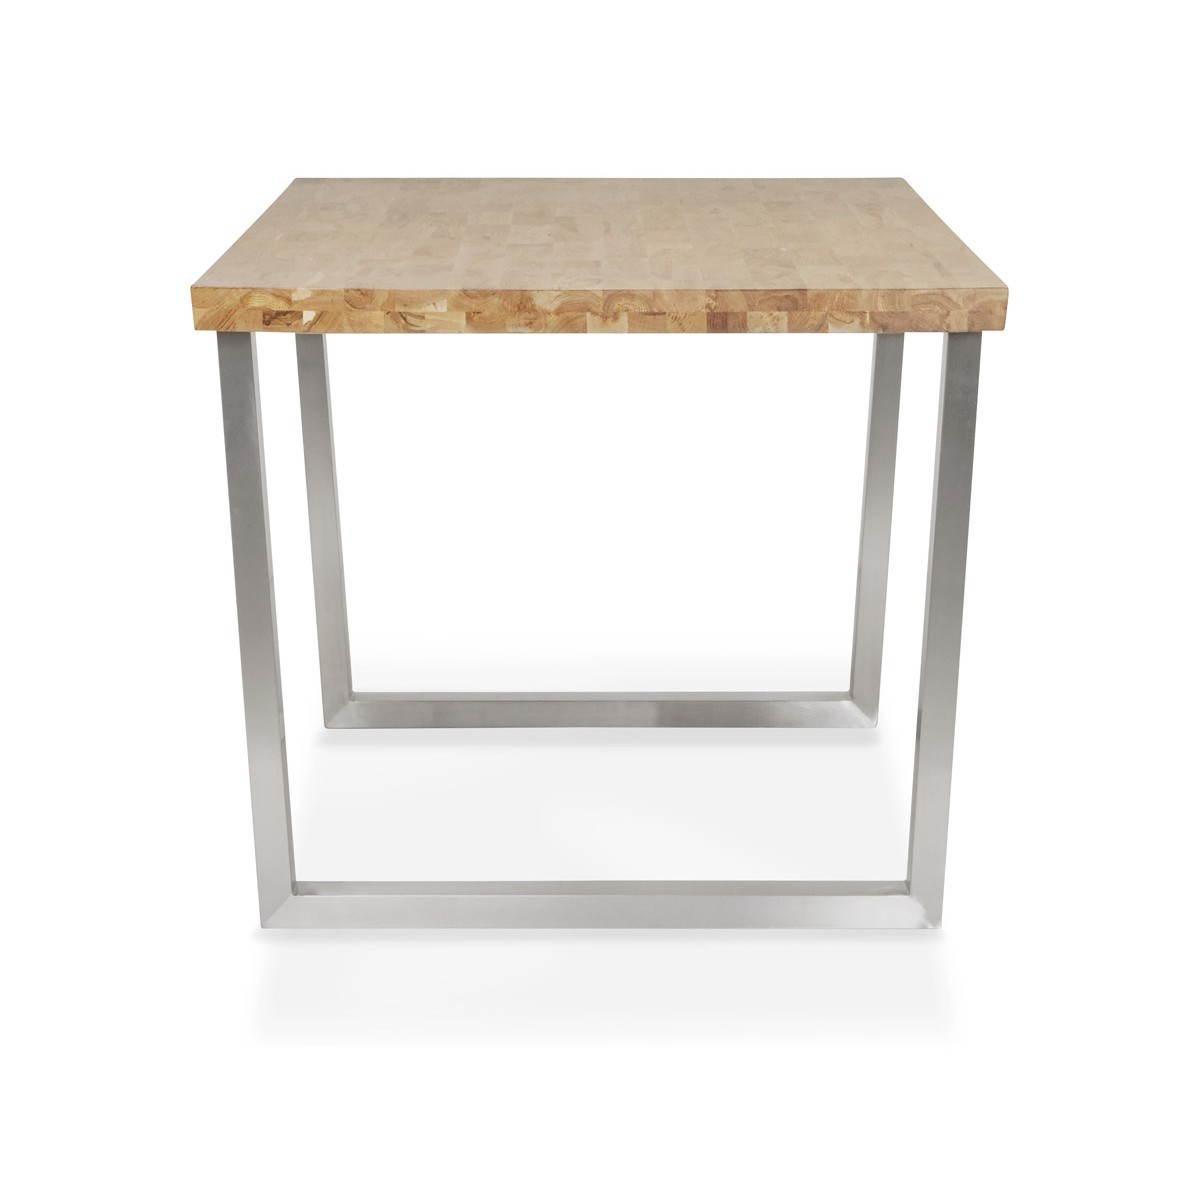 table moderne rectangulaire panou en ch ne massif bois naturel fran ais french. Black Bedroom Furniture Sets. Home Design Ideas